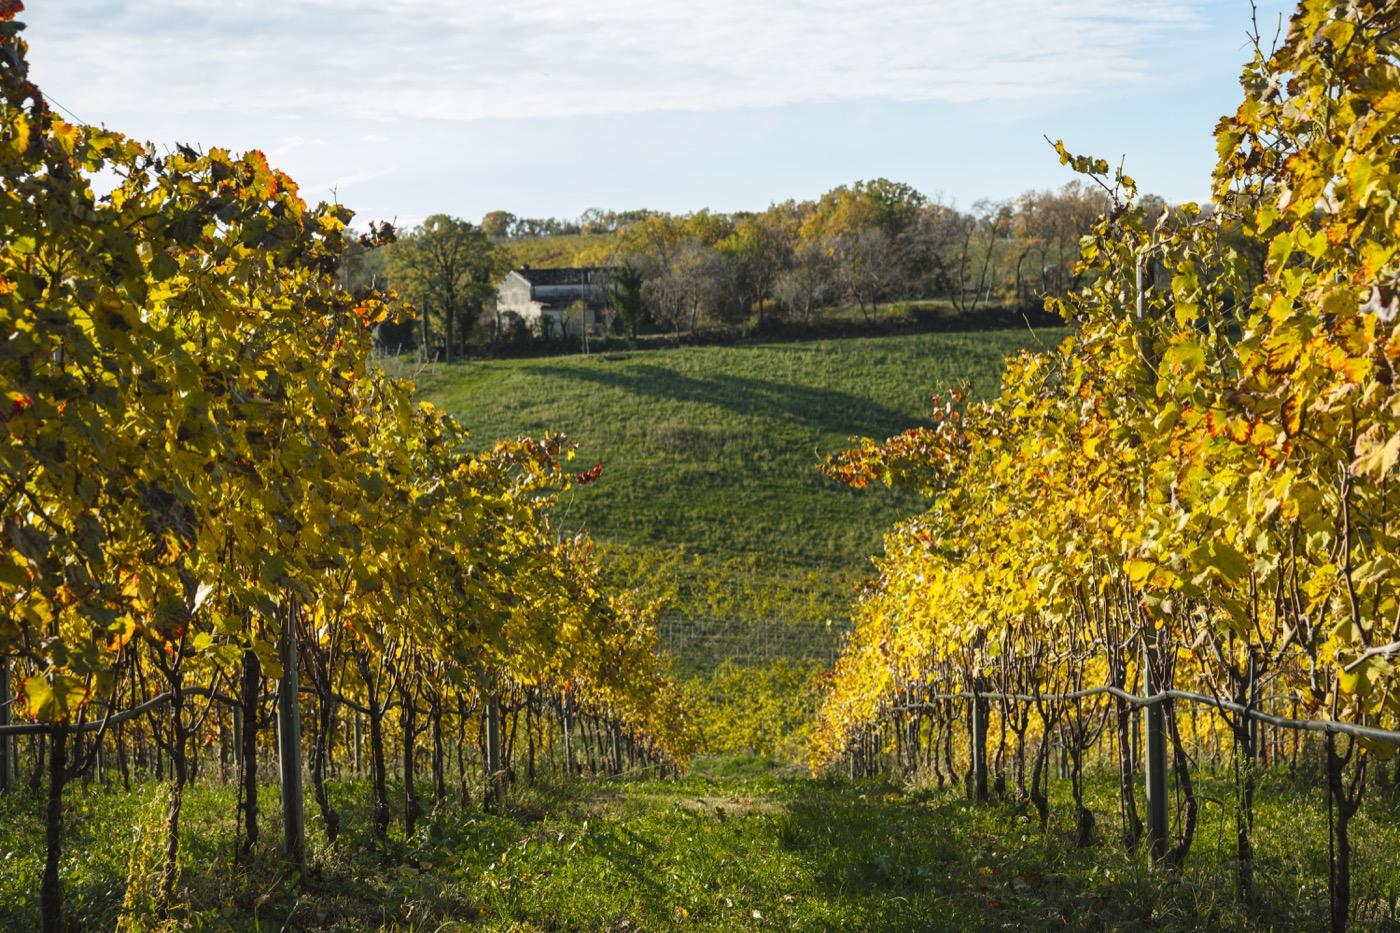 Sauro-Maule-Vigne-cantina-vini-L1150859_p_lr_1400